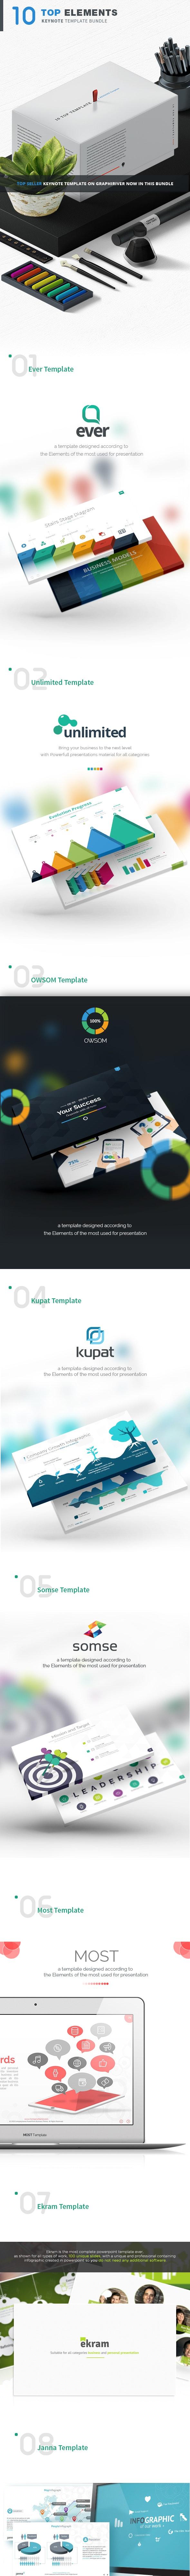 10 Top Keynote Template - Creative Keynote Templates